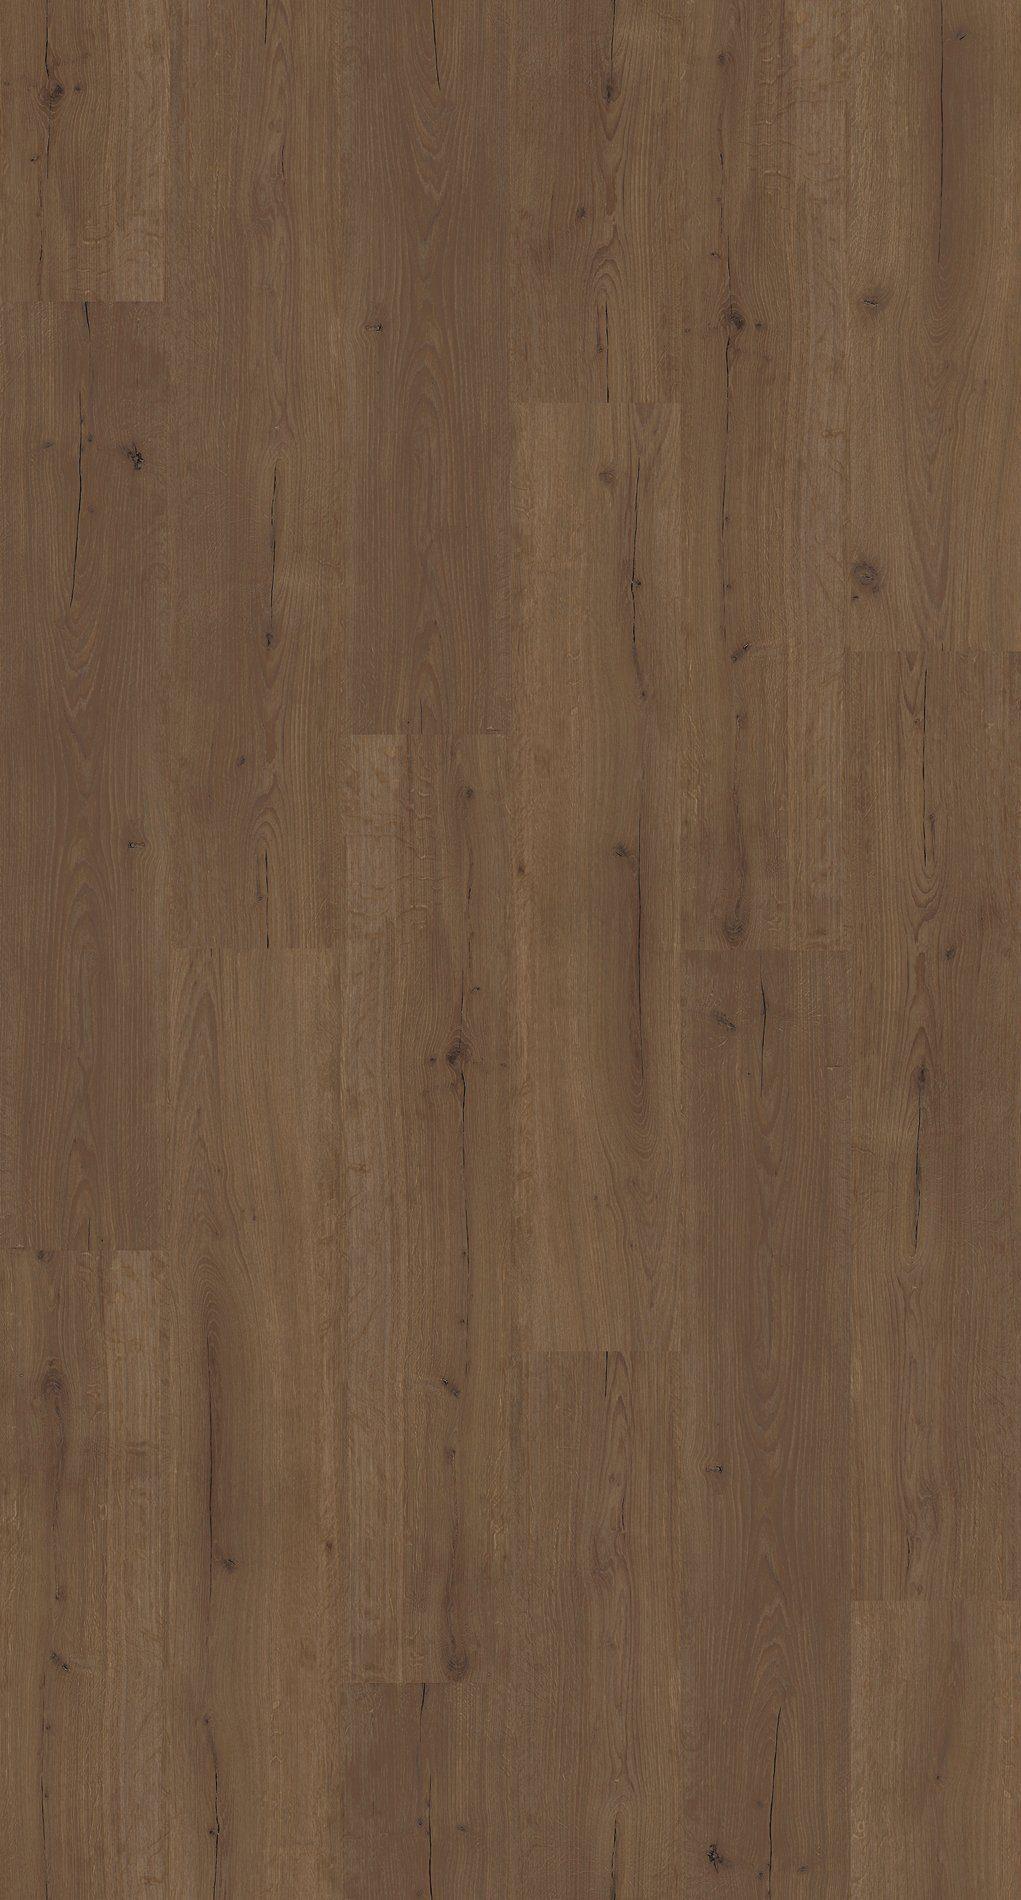 PARADOR Packung: Vinylboden »Basic 30 - Eiche Infinity Antik«, 1214 x 216 x 8,1 mm, 1,8 m²